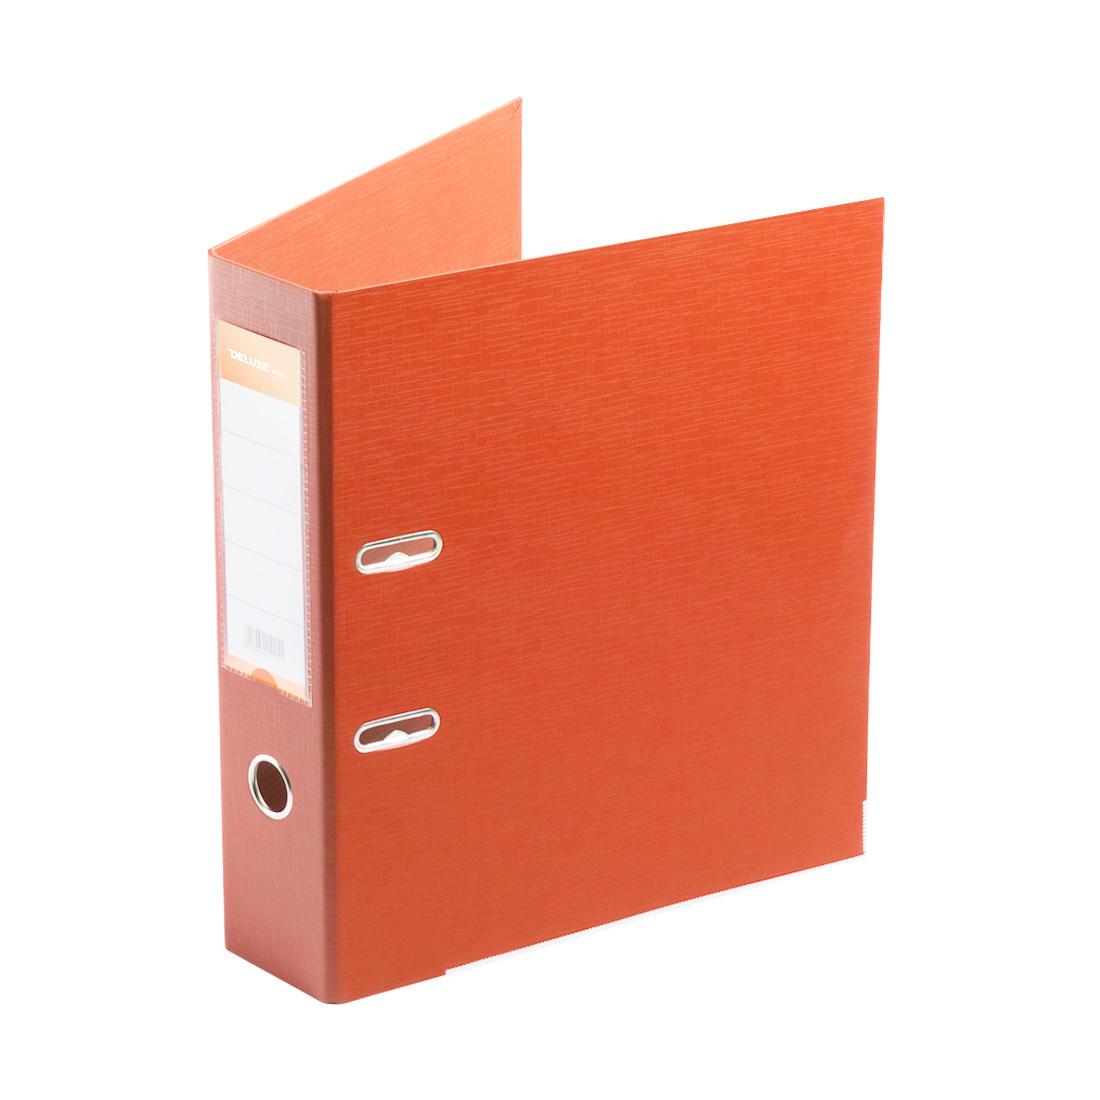 Папка–регистратор с арочным механизмом Deluxe Office 3-OE6 (70 мм, А4)